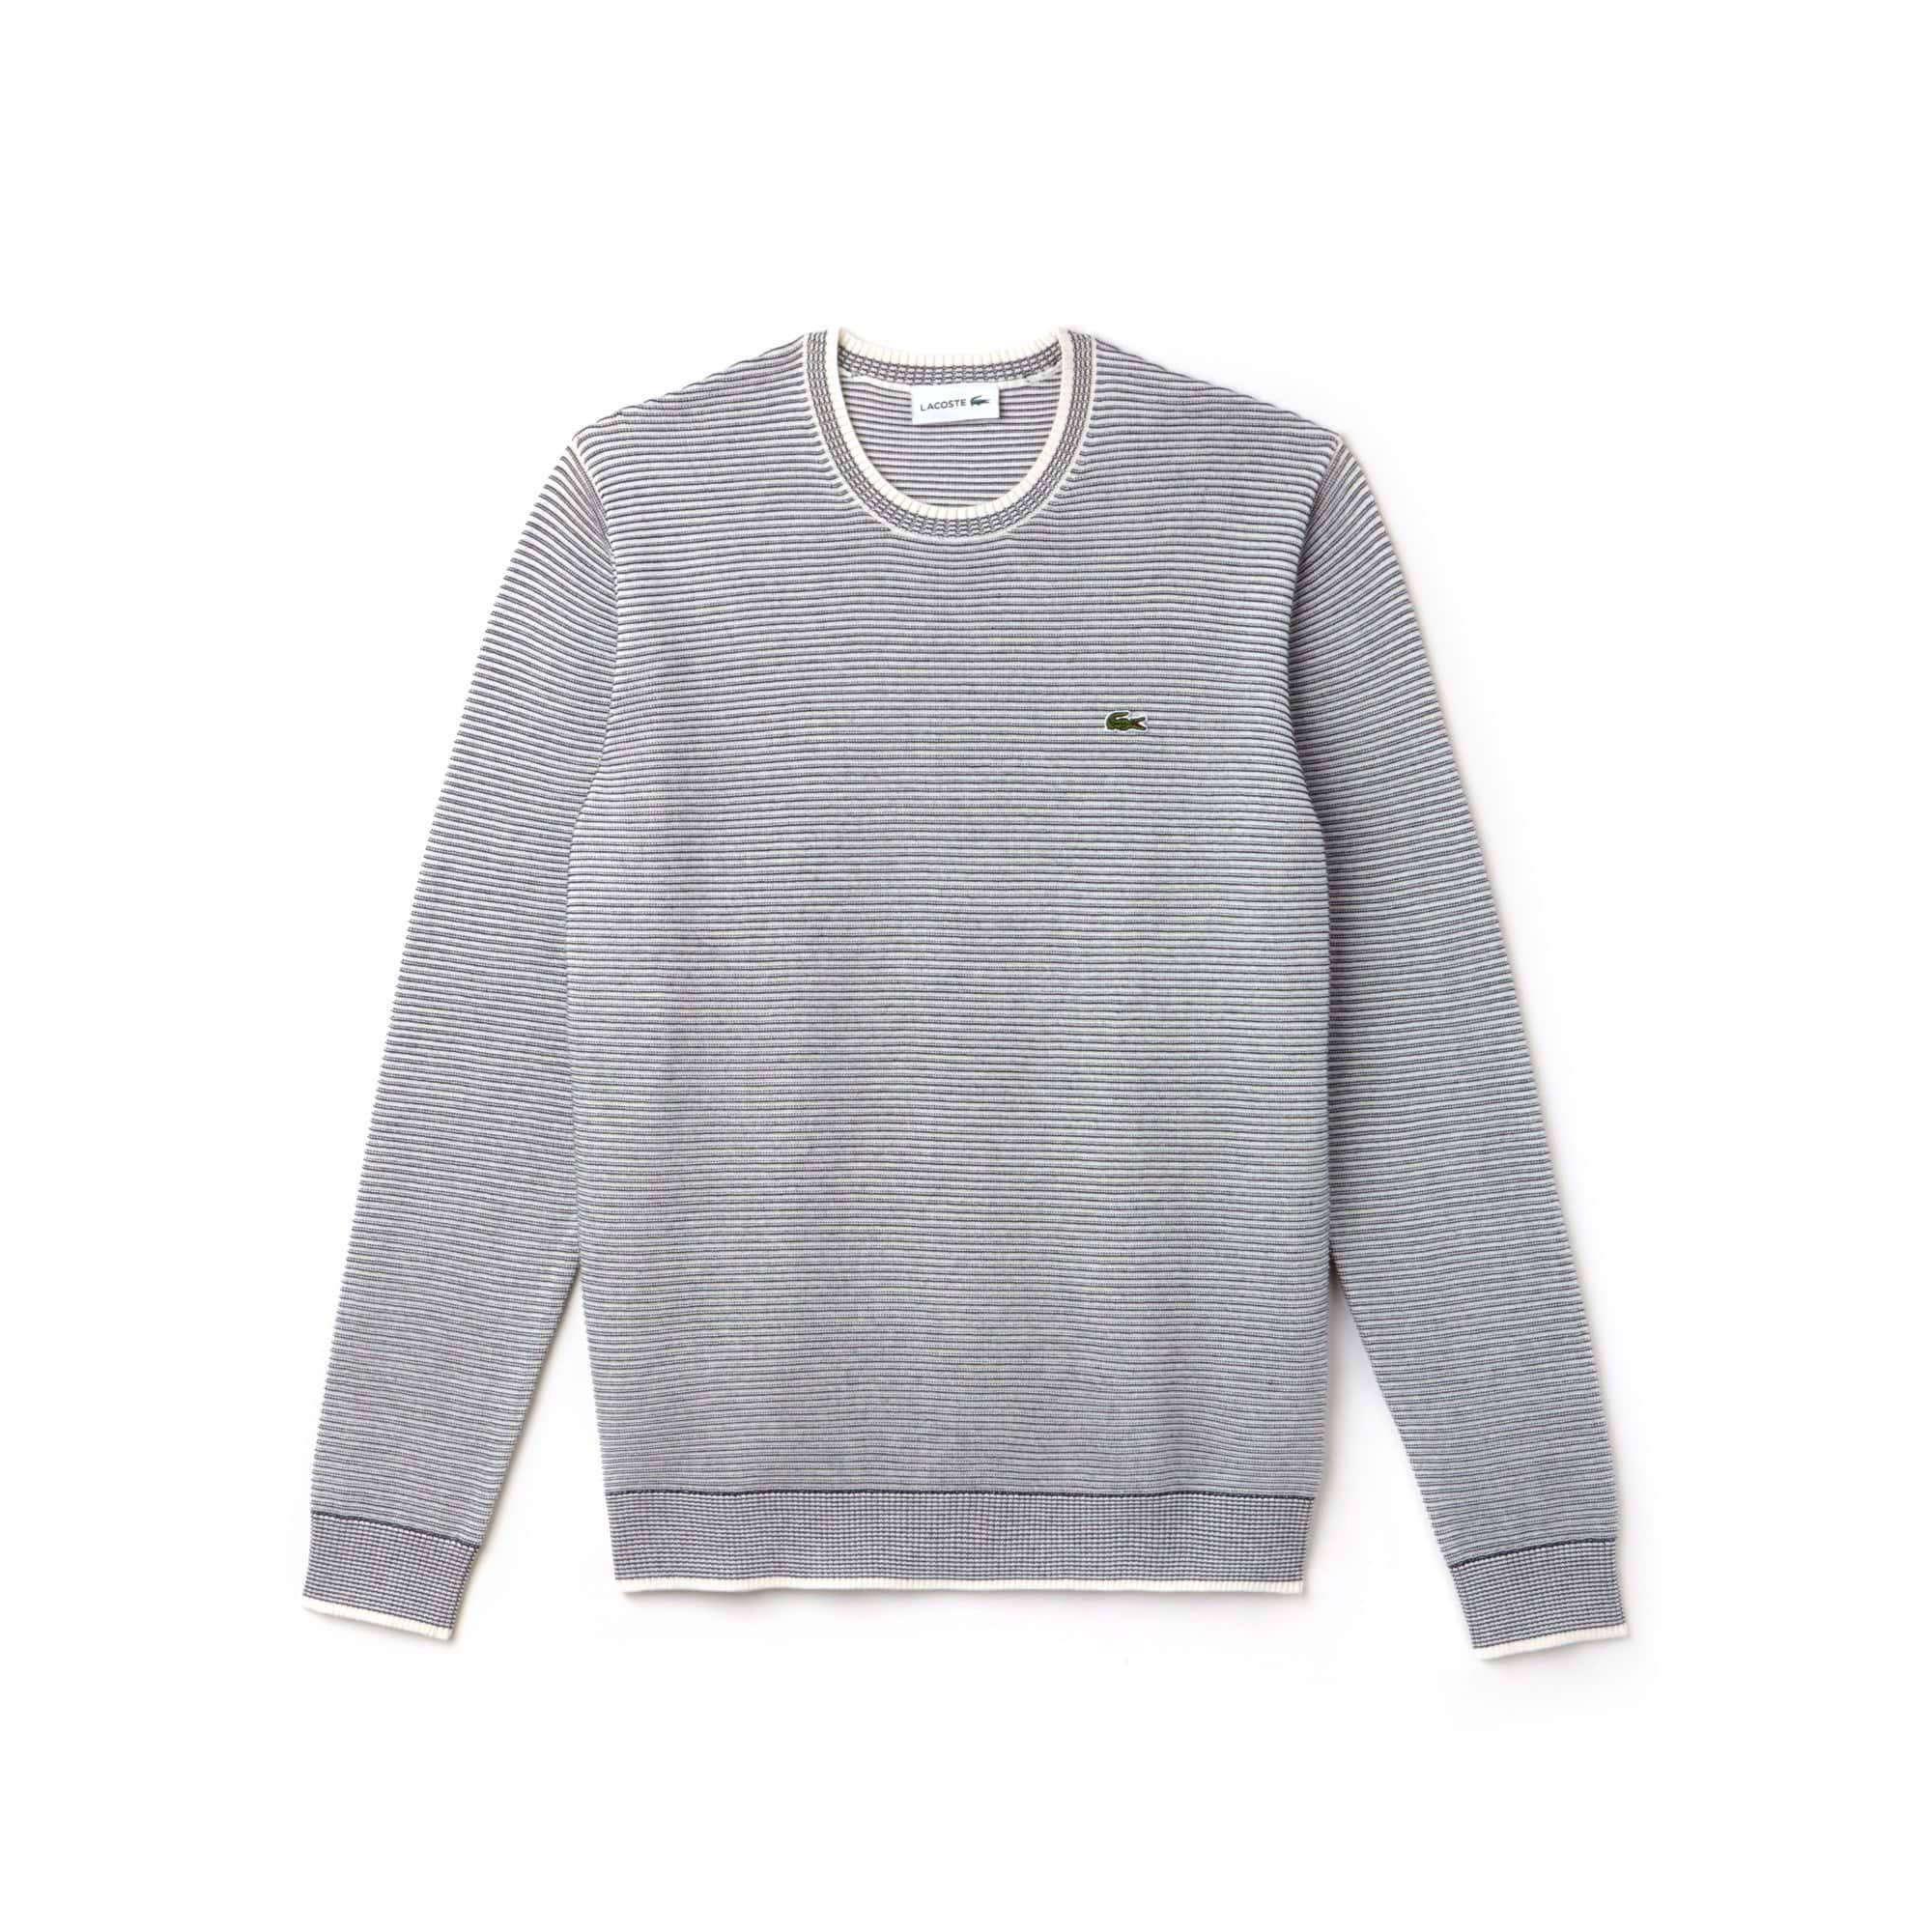 Men's Crew Neck Pinstriped Ottoman Cotton Sweater